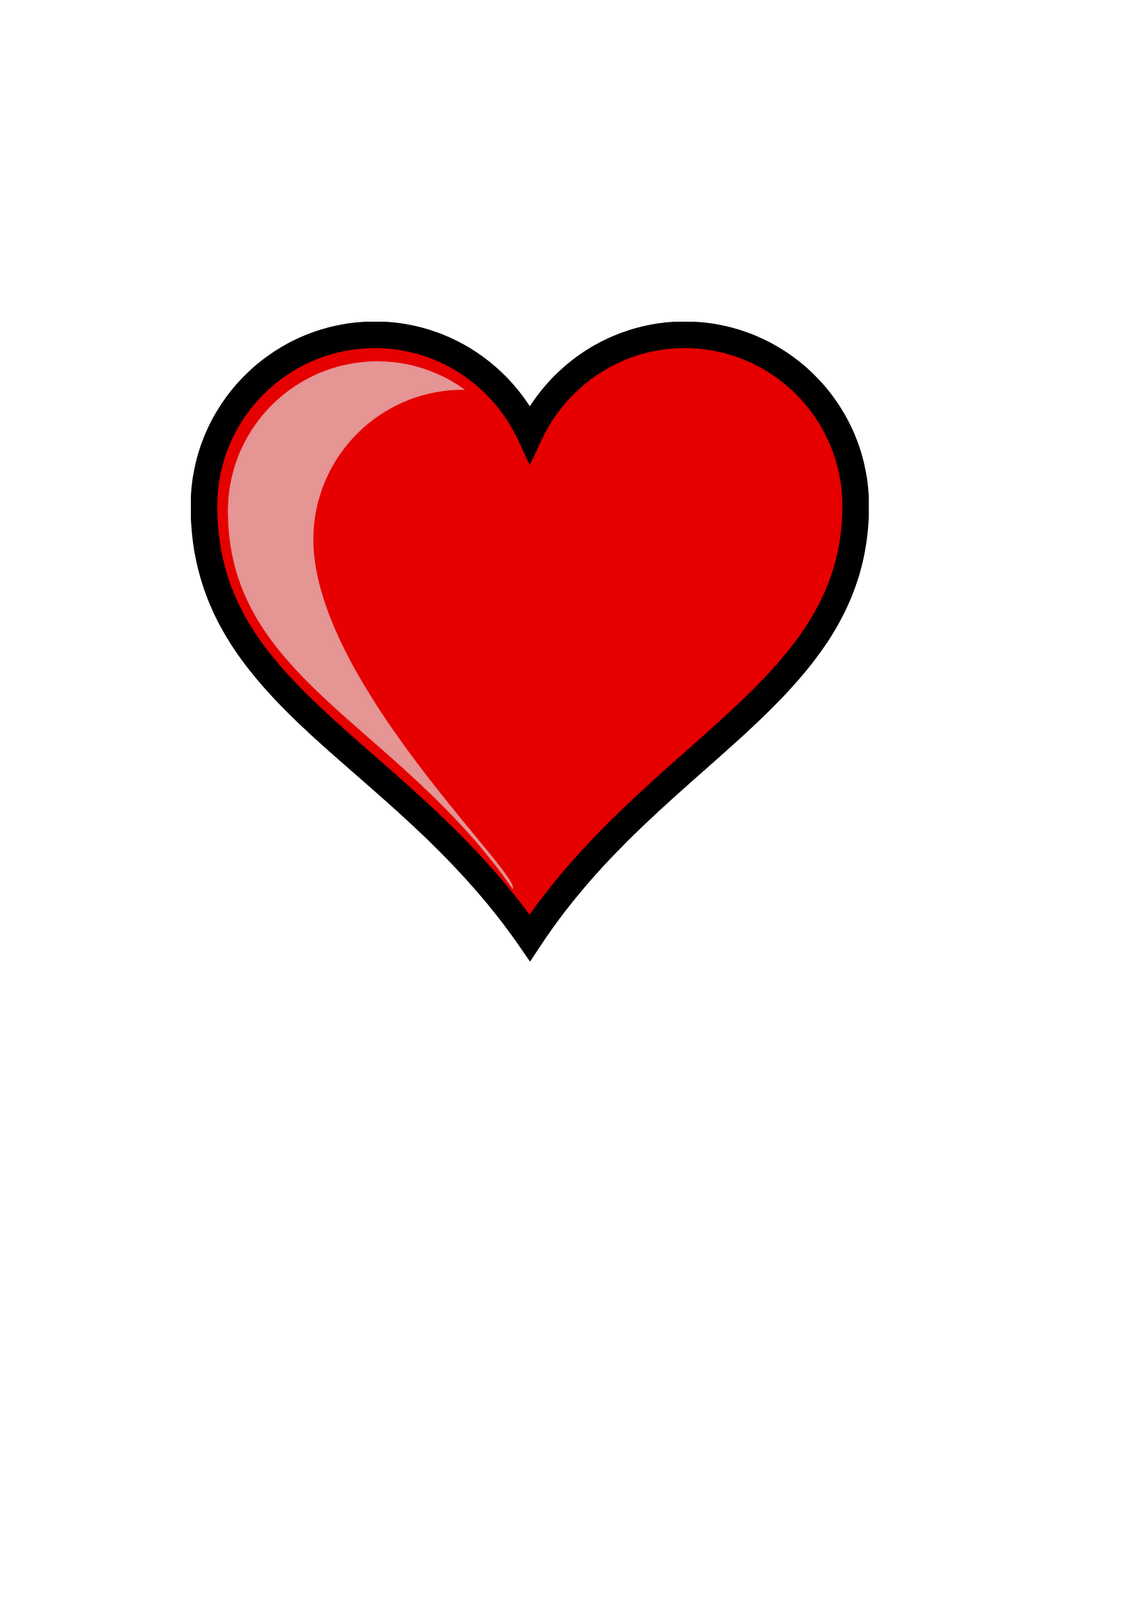 Free Valentineu0026#39;s Day Clip Art | -Free Valentineu0026#39;s Day Clip Art | 2014 Valentine Card, Free-2